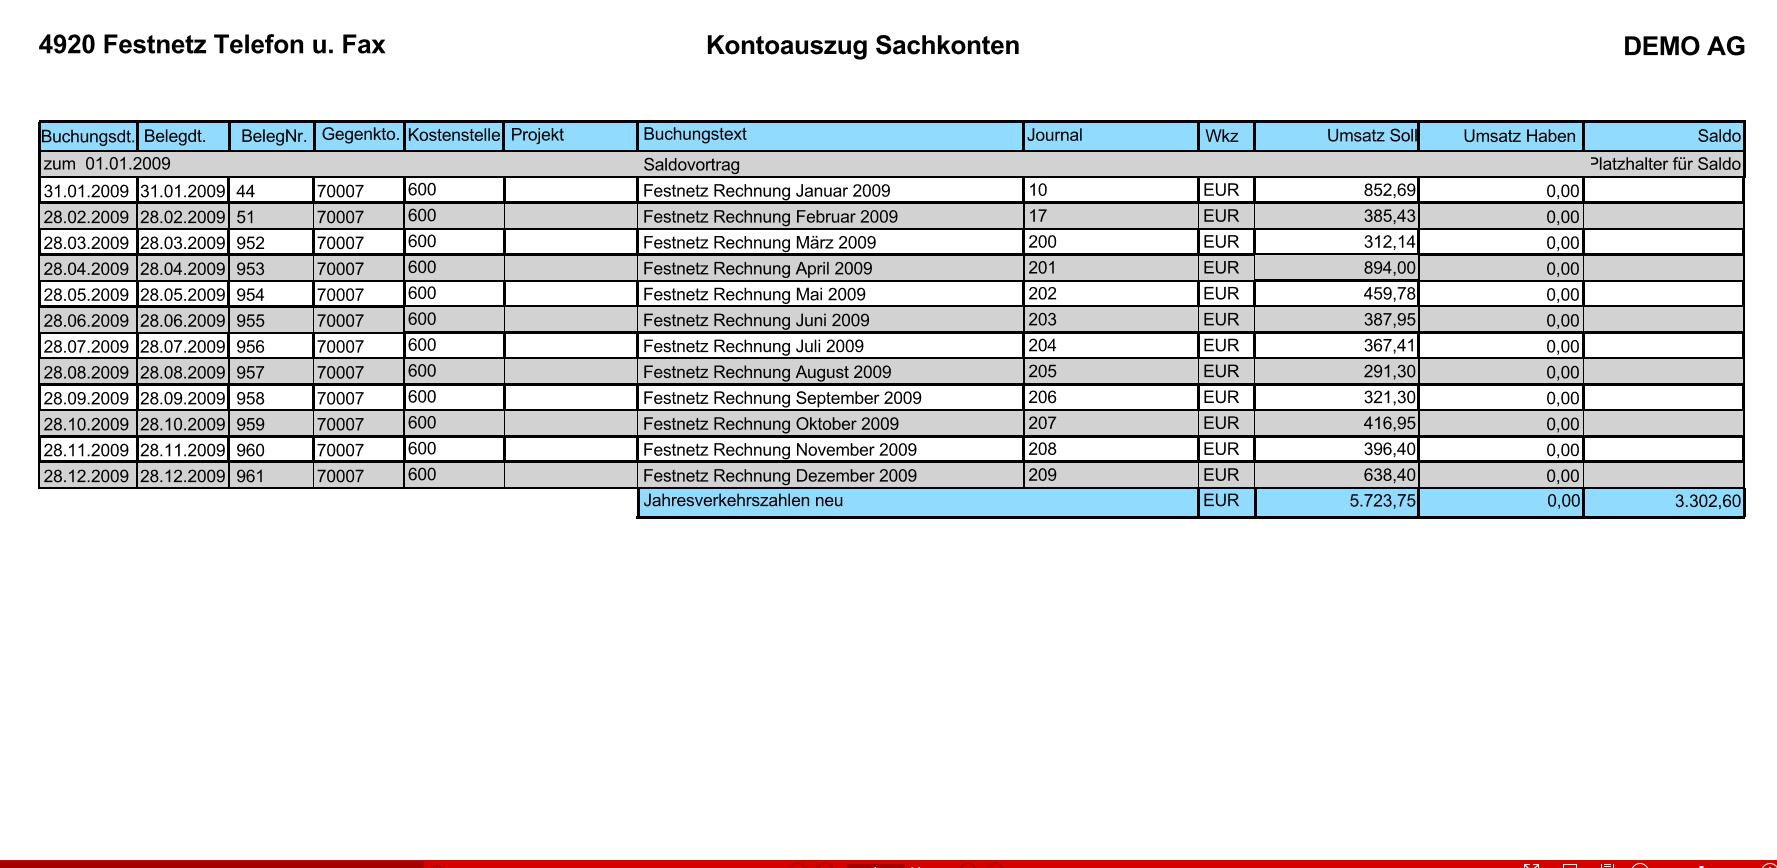 Report-Kontoauszug-Sachkonten